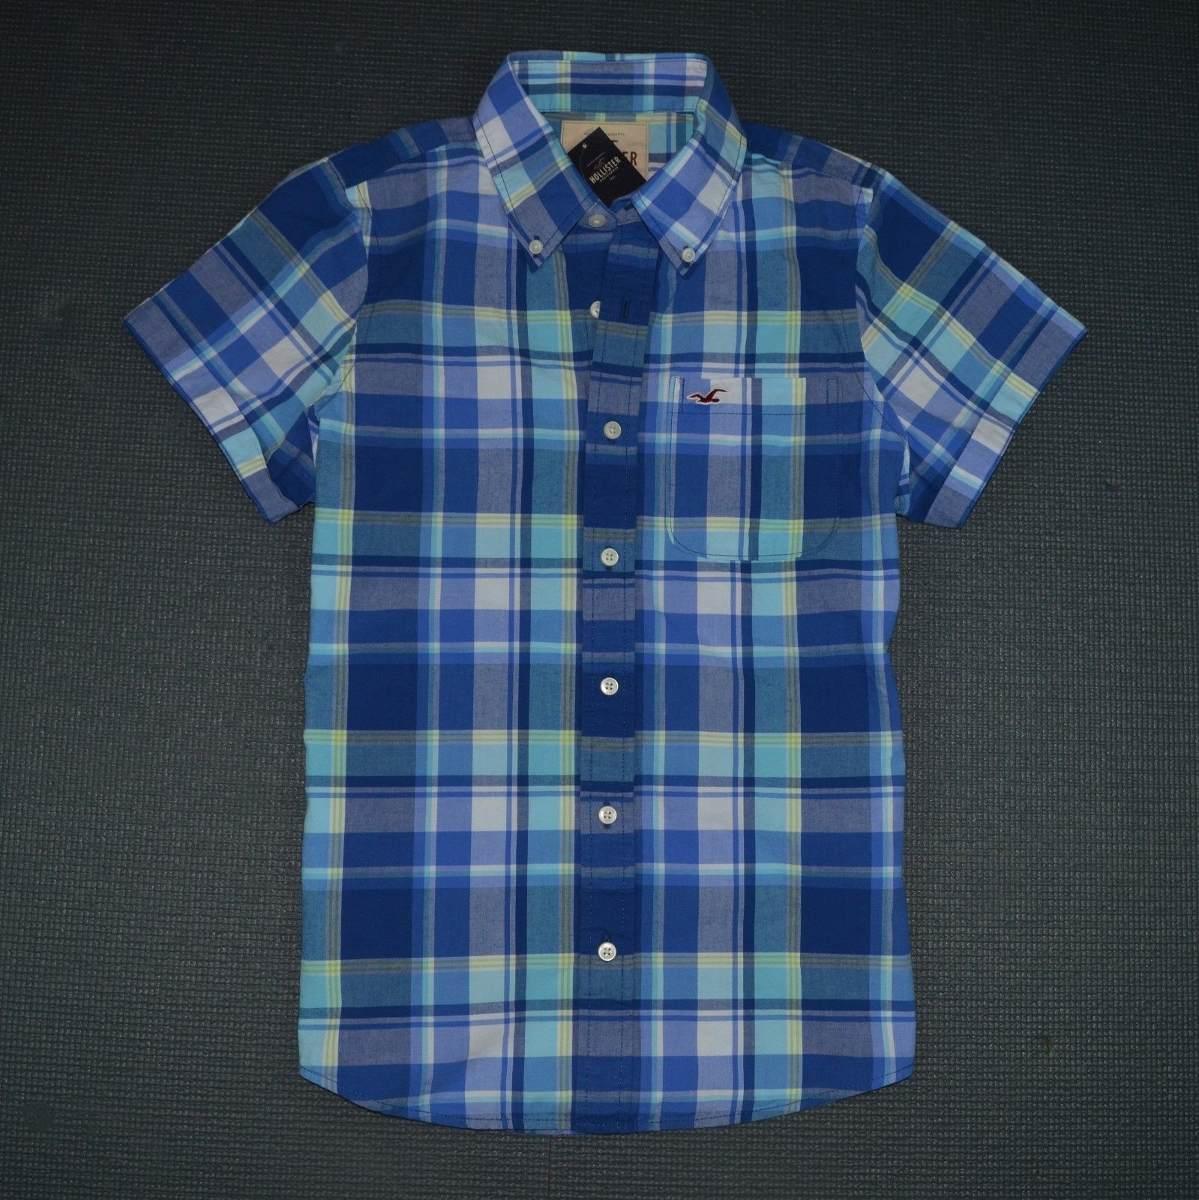 Camisas Abercrombie Para Hombre Mercadolibre